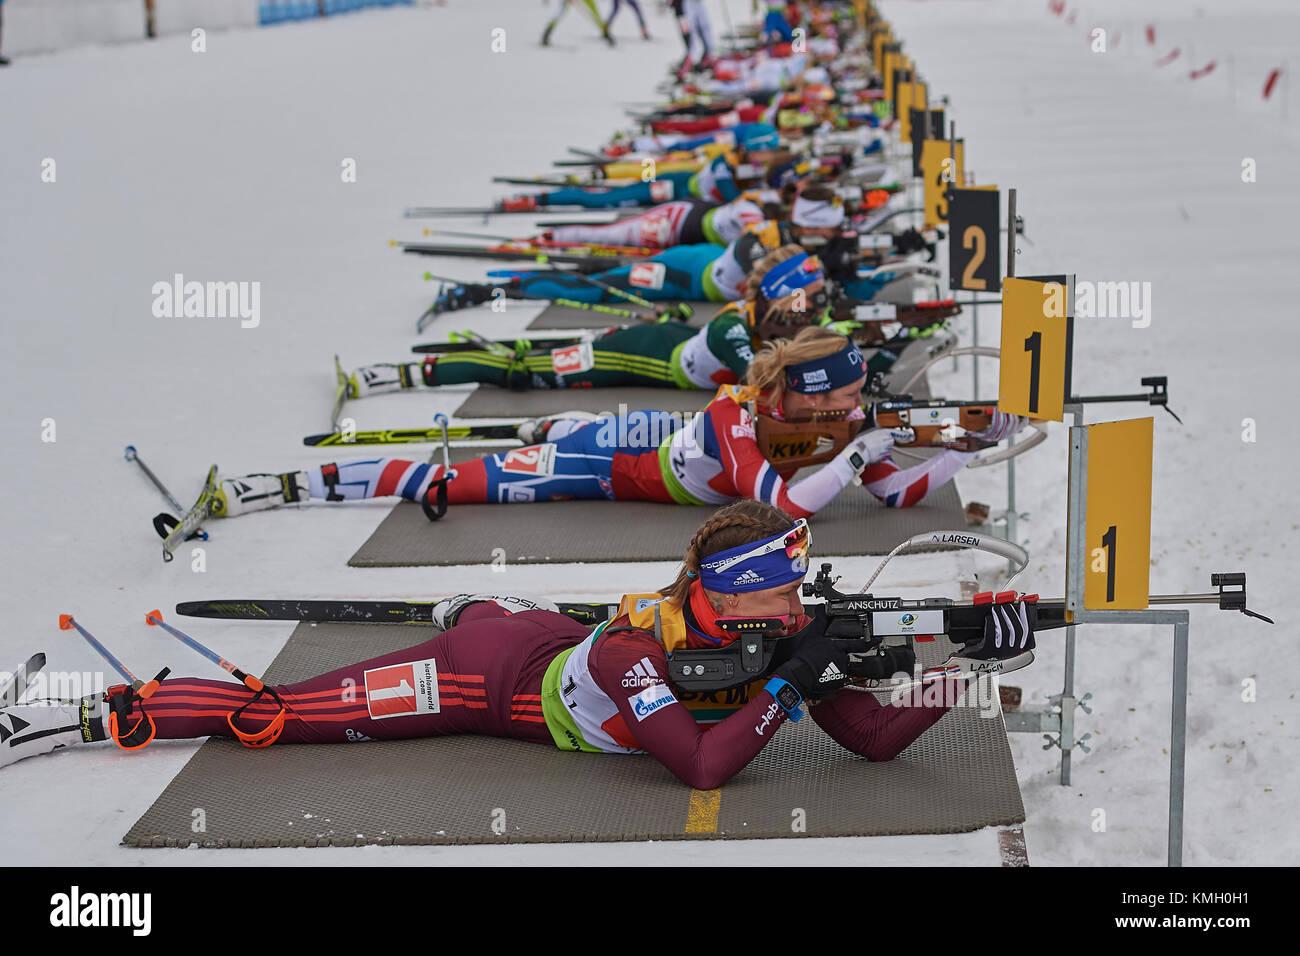 Lenzerheide, Switzerland. 8th Dec, 2017. Ladies during the IBU Biathlon Cup Single Mixed Relay in Lenzerheide. Credit: - Stock Image